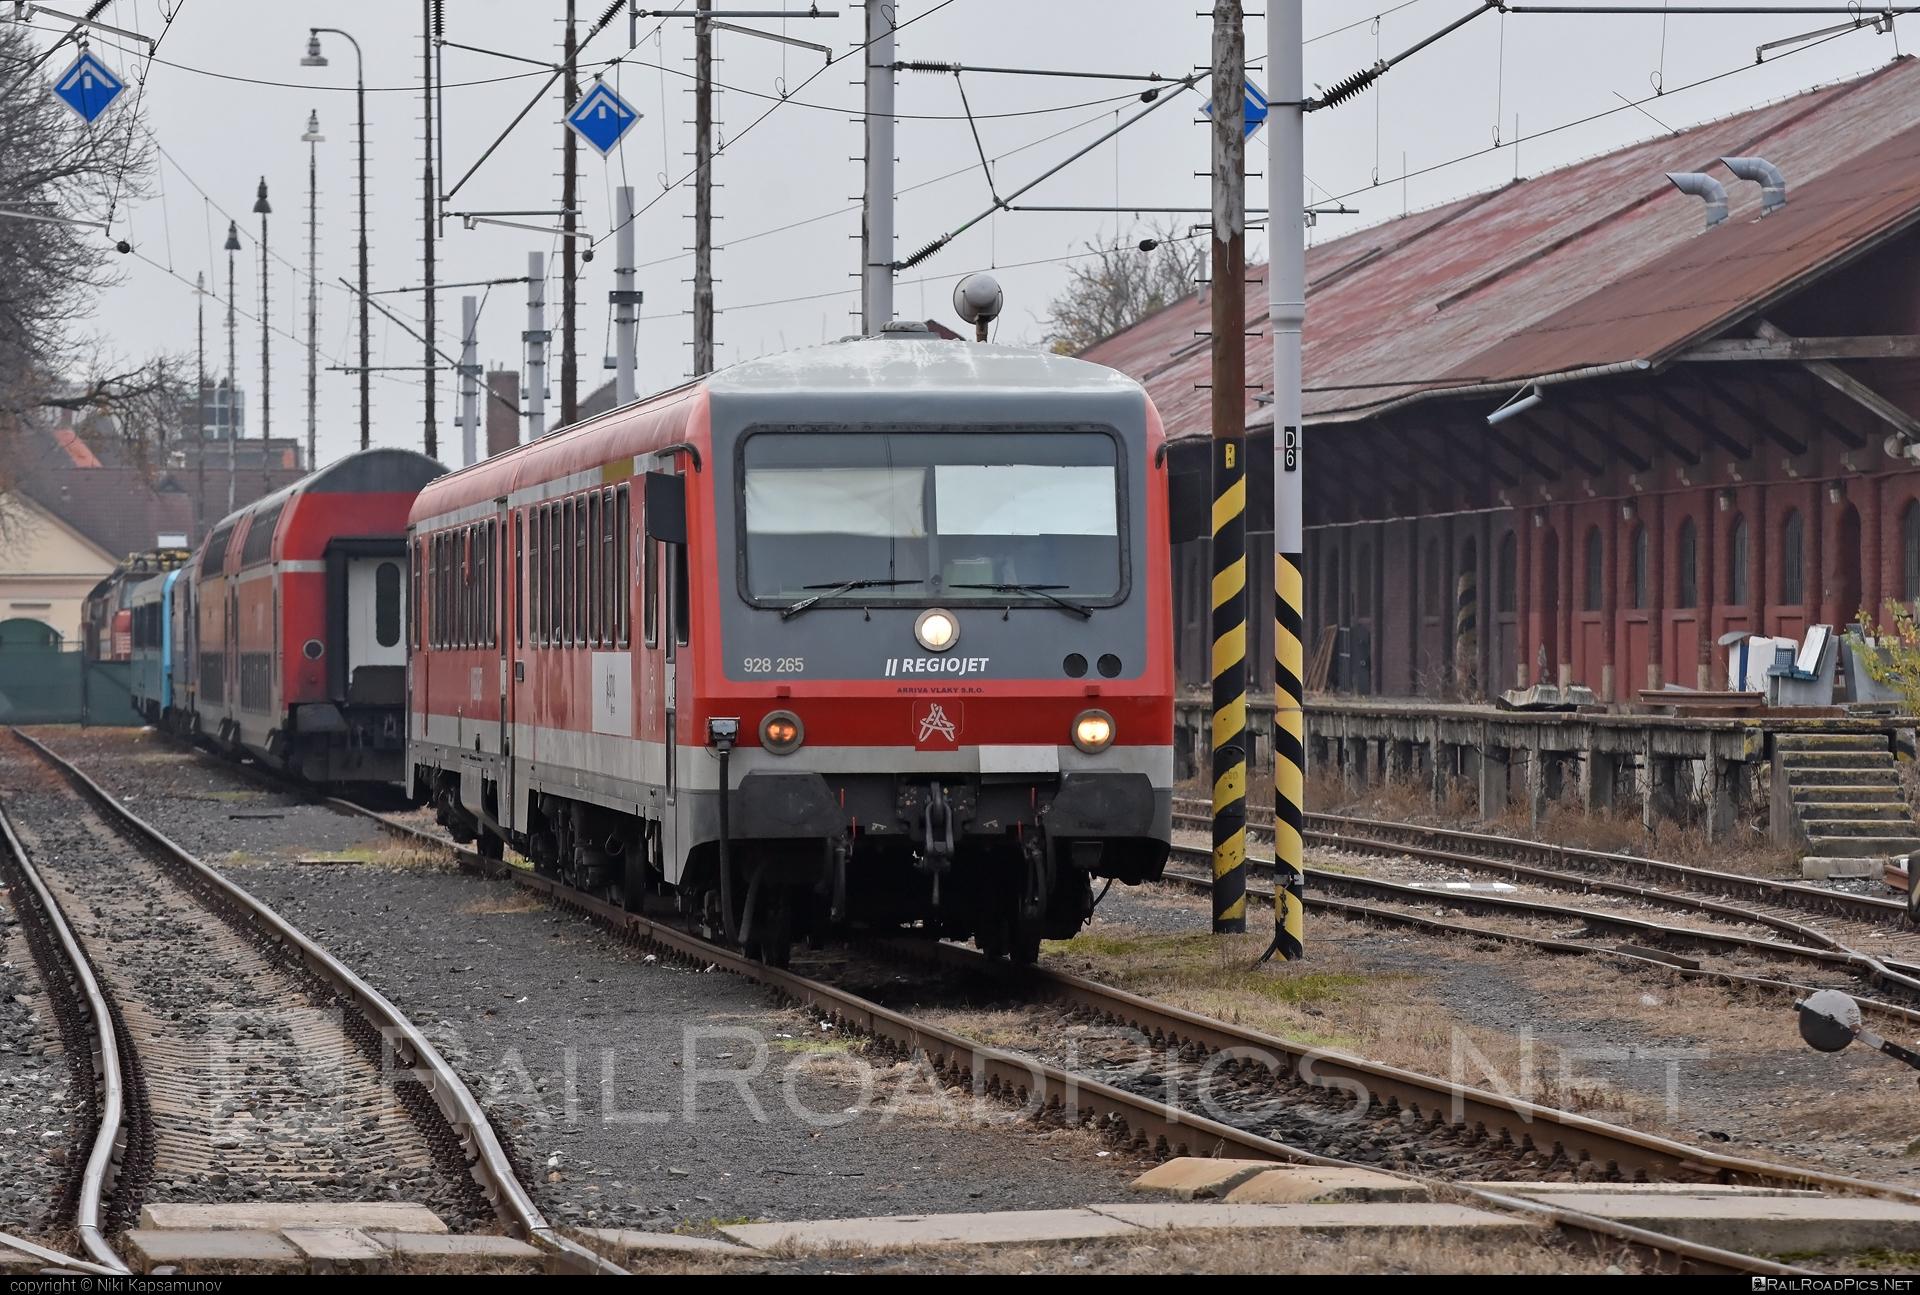 Düwag DB Class 628 - 928 265 operated by RegioJet, a.s. #arriva #arrivavlaky #arrivavlakysro #dbclass628 #duewag #duewag628 #duwag #duwag628 #regiojet